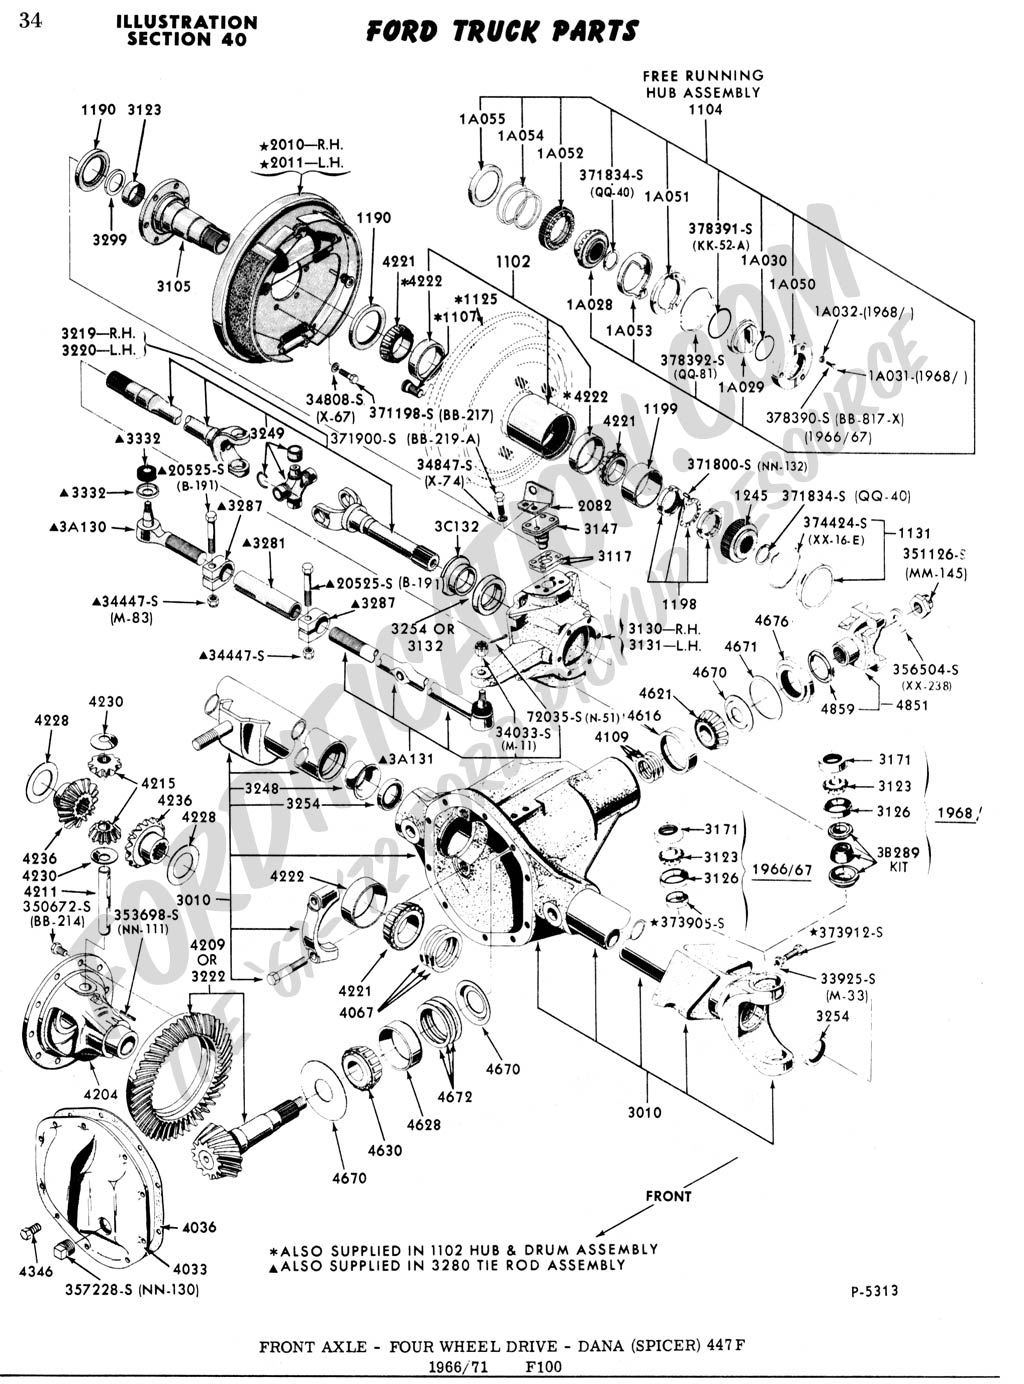 dana 44 front axle diagram